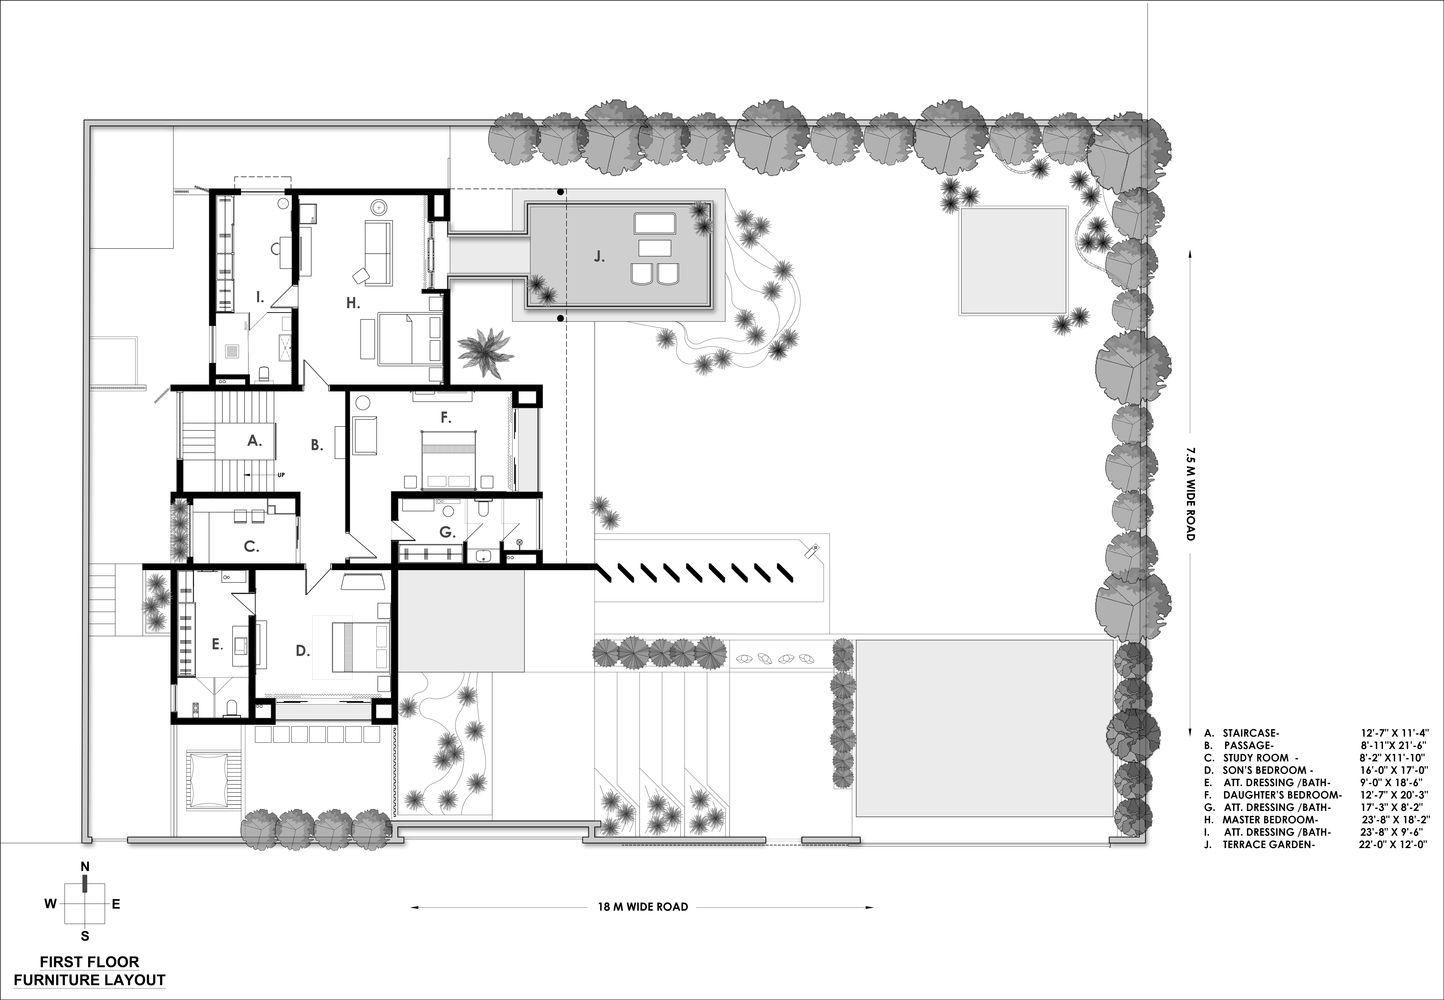 Gallery Of 02 The Hidden House A T Associates 27 In 2020 Hidden House Floor Plans Sims House Plans